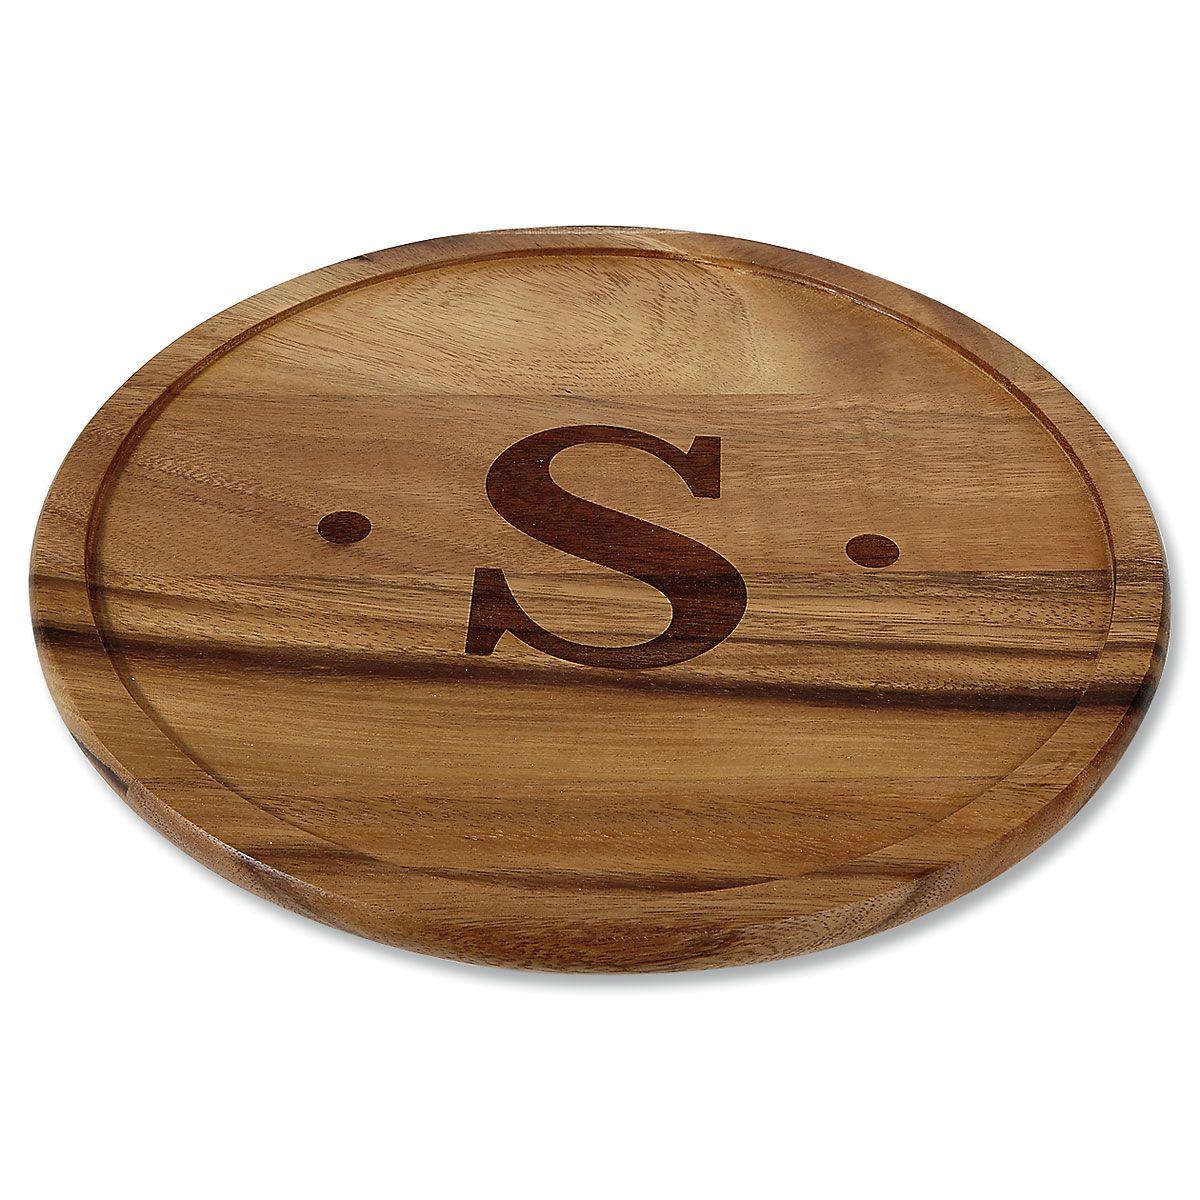 Monogram Initial with Dots Acacia Wood Lazy Susan